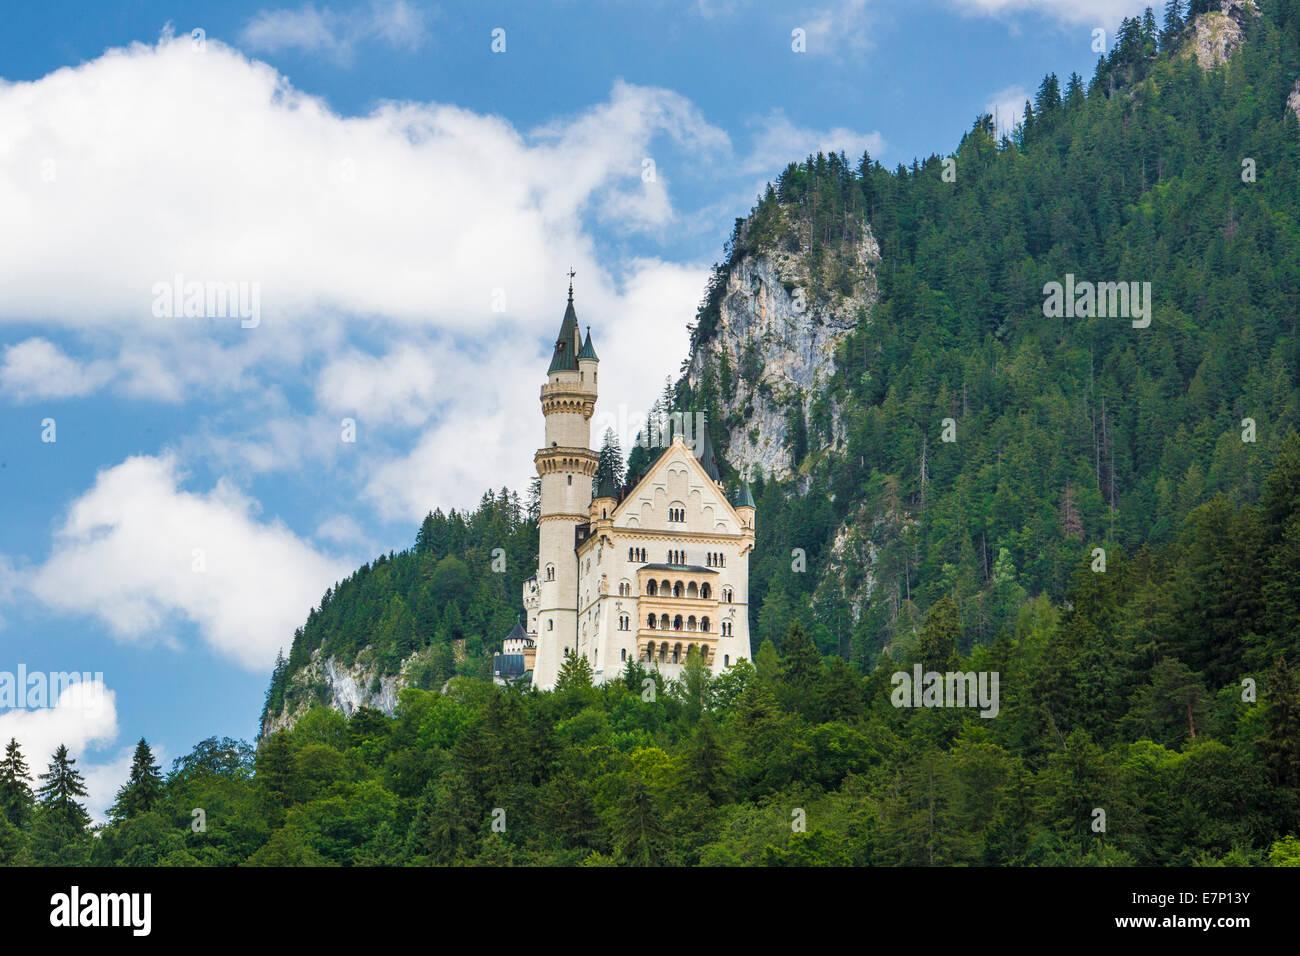 Fussen, Germany, Europe, architecture, Bavaria, castle, city, famous, history, neuschwanstein, romantic road, spring, - Stock Image